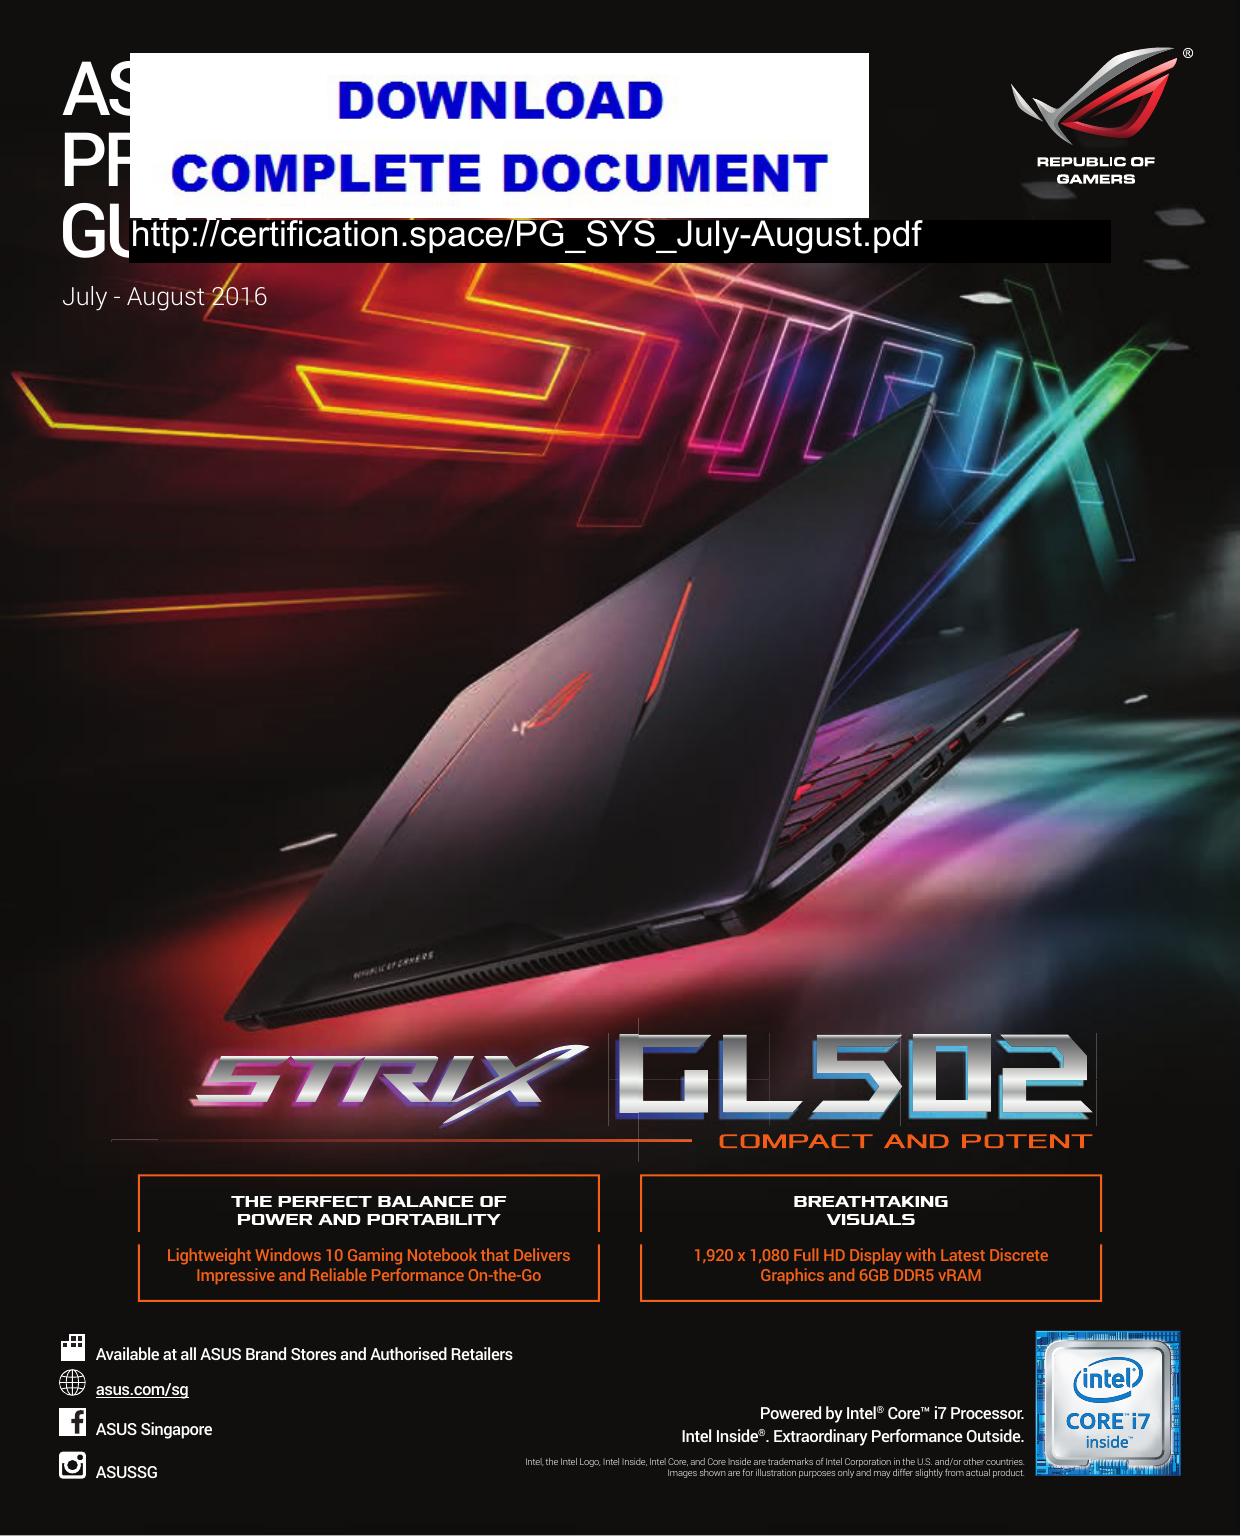 ASUS PRODUCT GUIDE | manualzz com